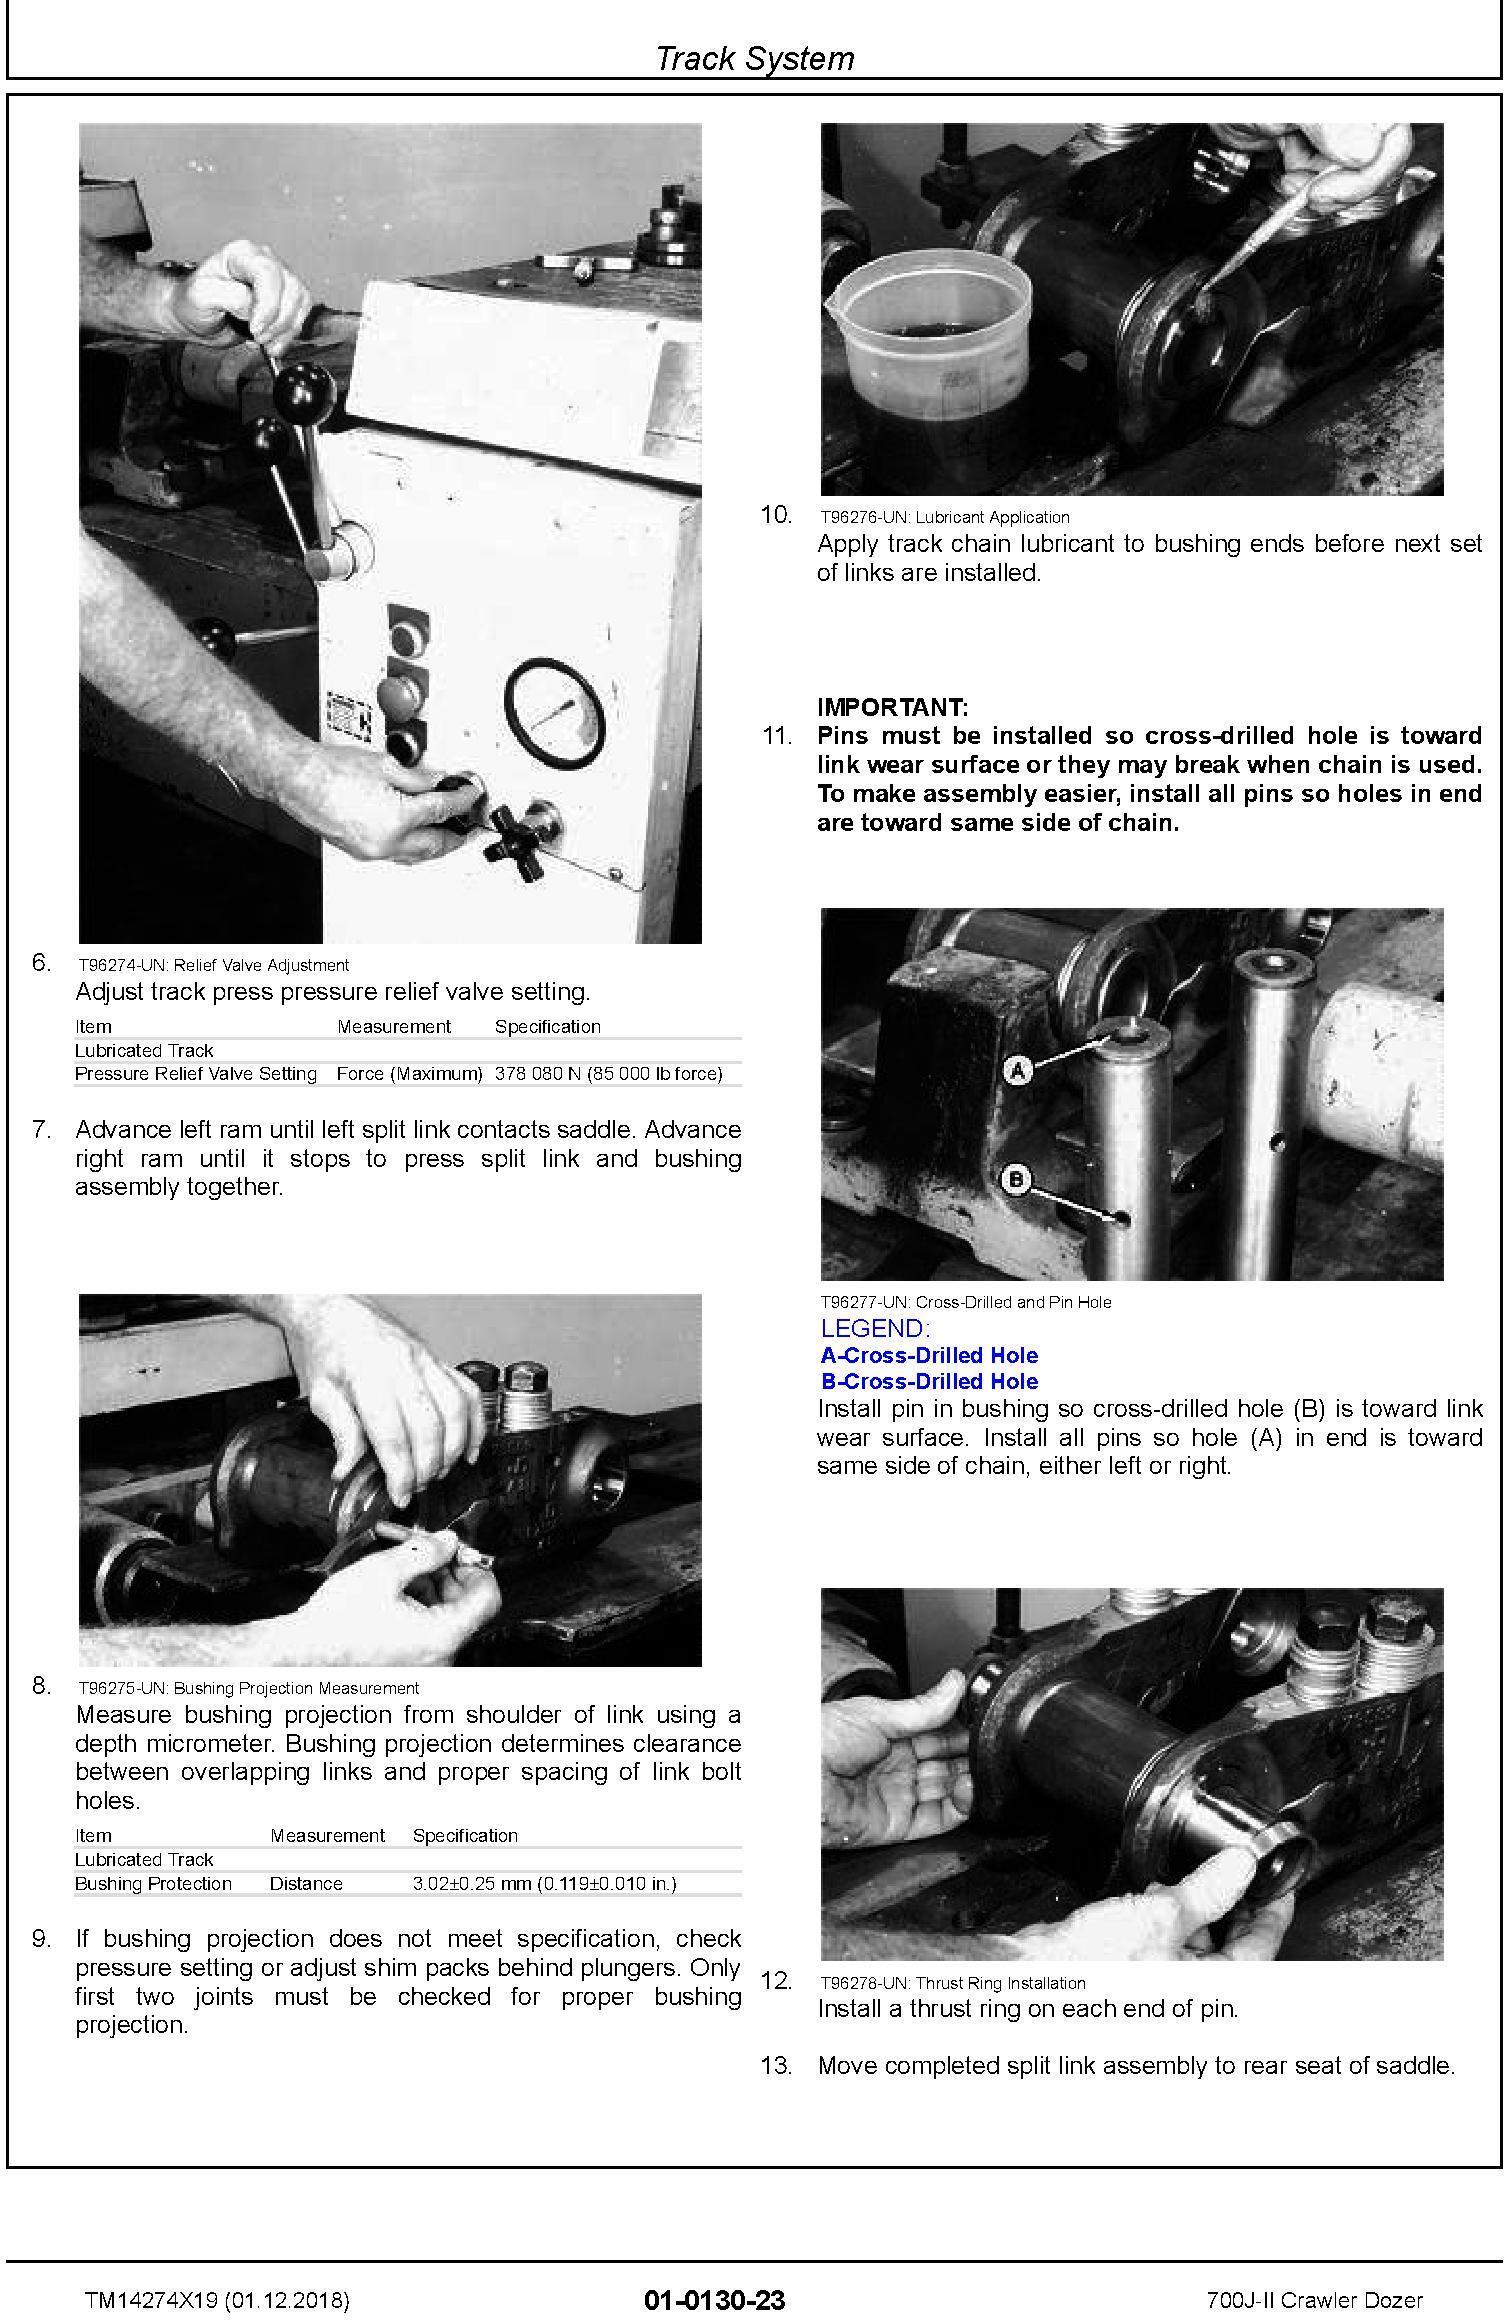 John Deere 700J-II (SN. D000001-) Crawler Dozer Repair Service Manual (TM14274X19) - 2